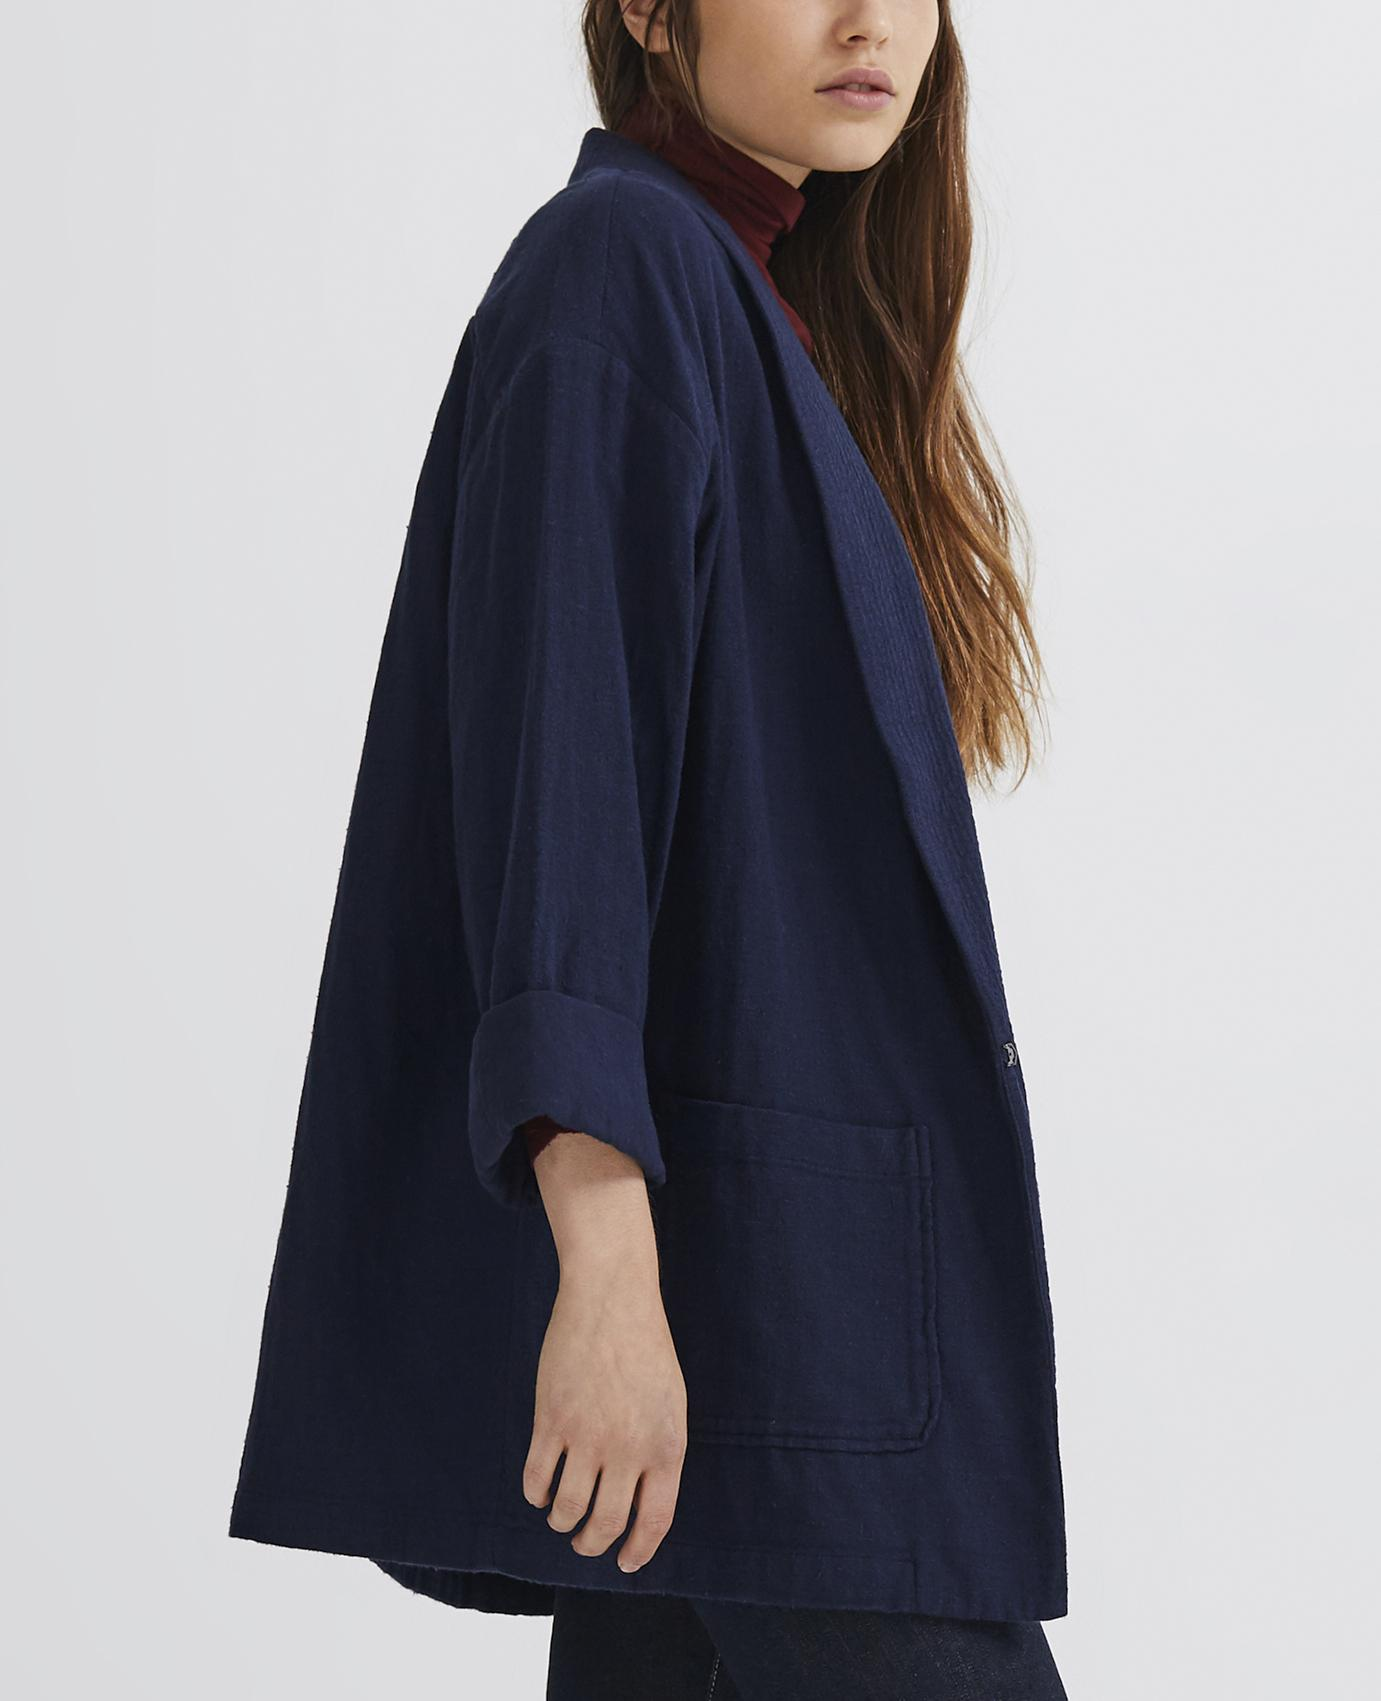 The Maura Jacket